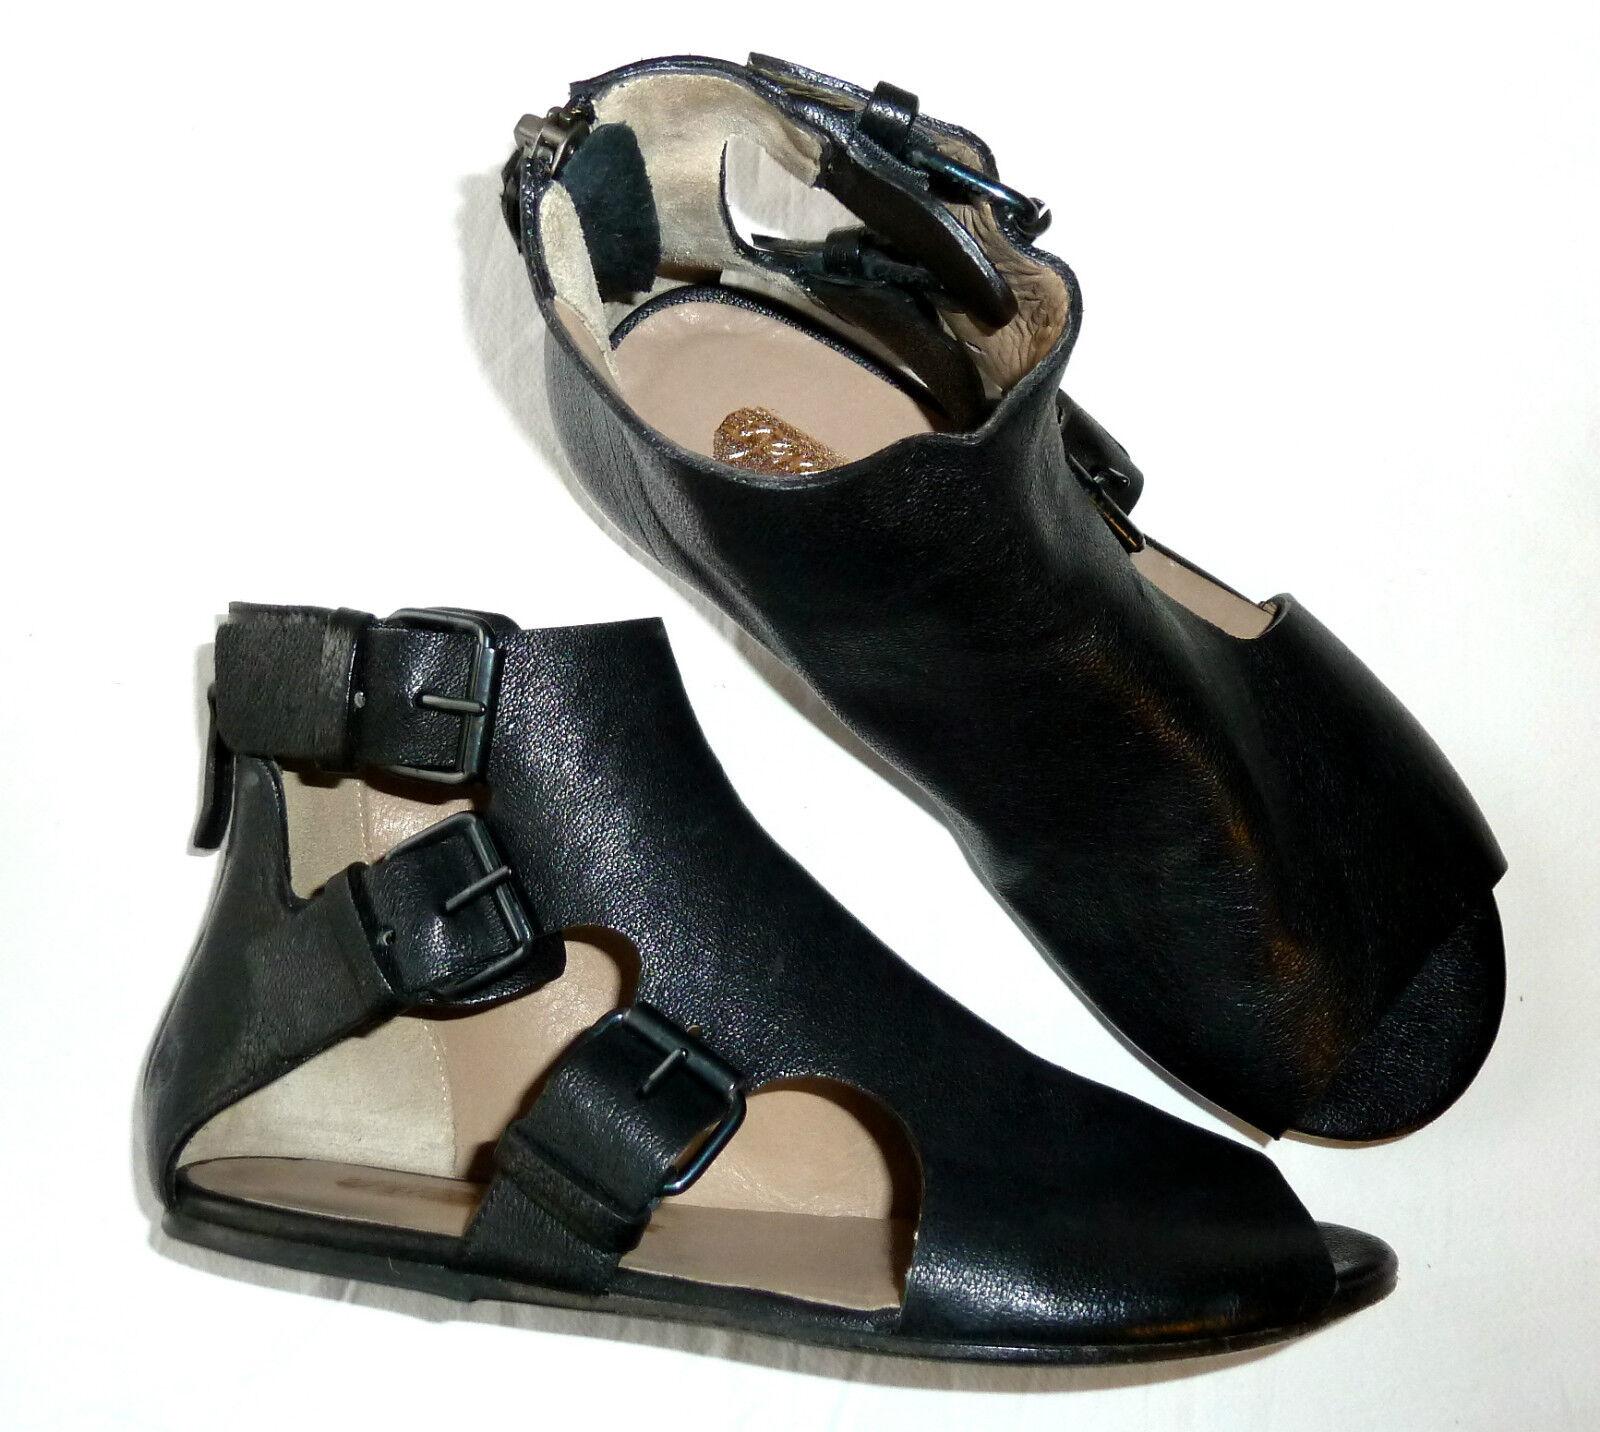 Marsell Sandalen, Leder, schwarz, schwarz, schwarz, Gr.36 (37), NP 4fcb5f